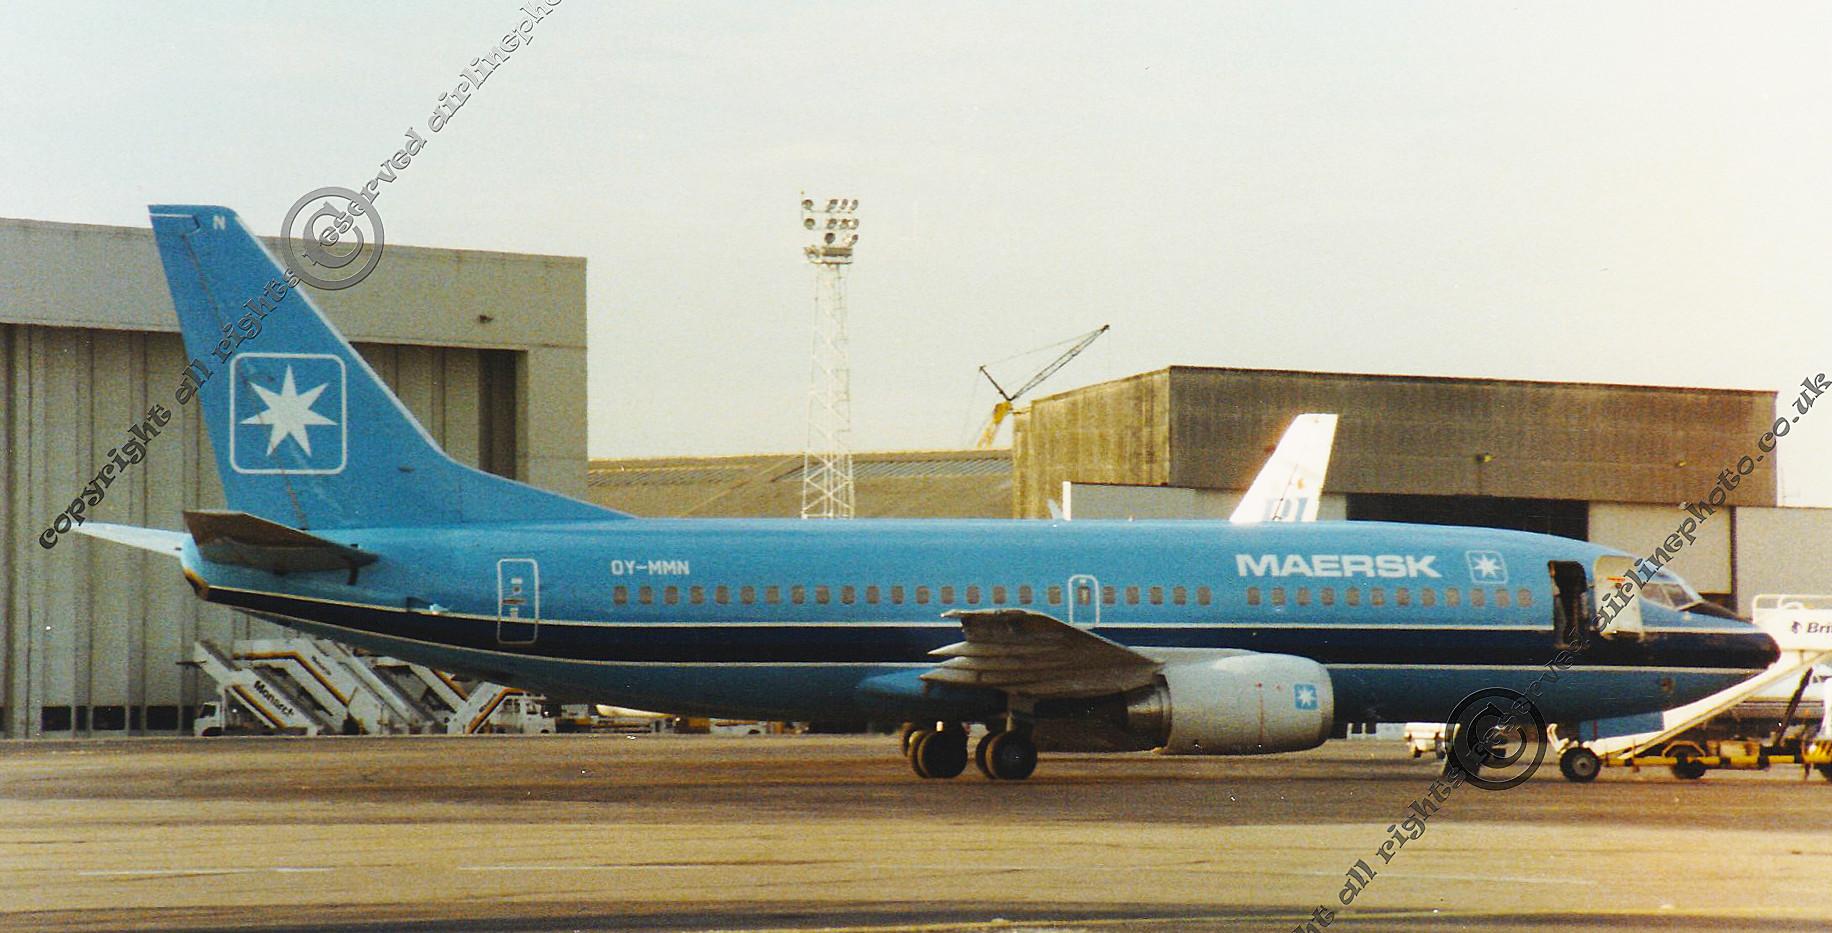 OY-MMN-MAERSK-air-737-LTN-1988.jpg